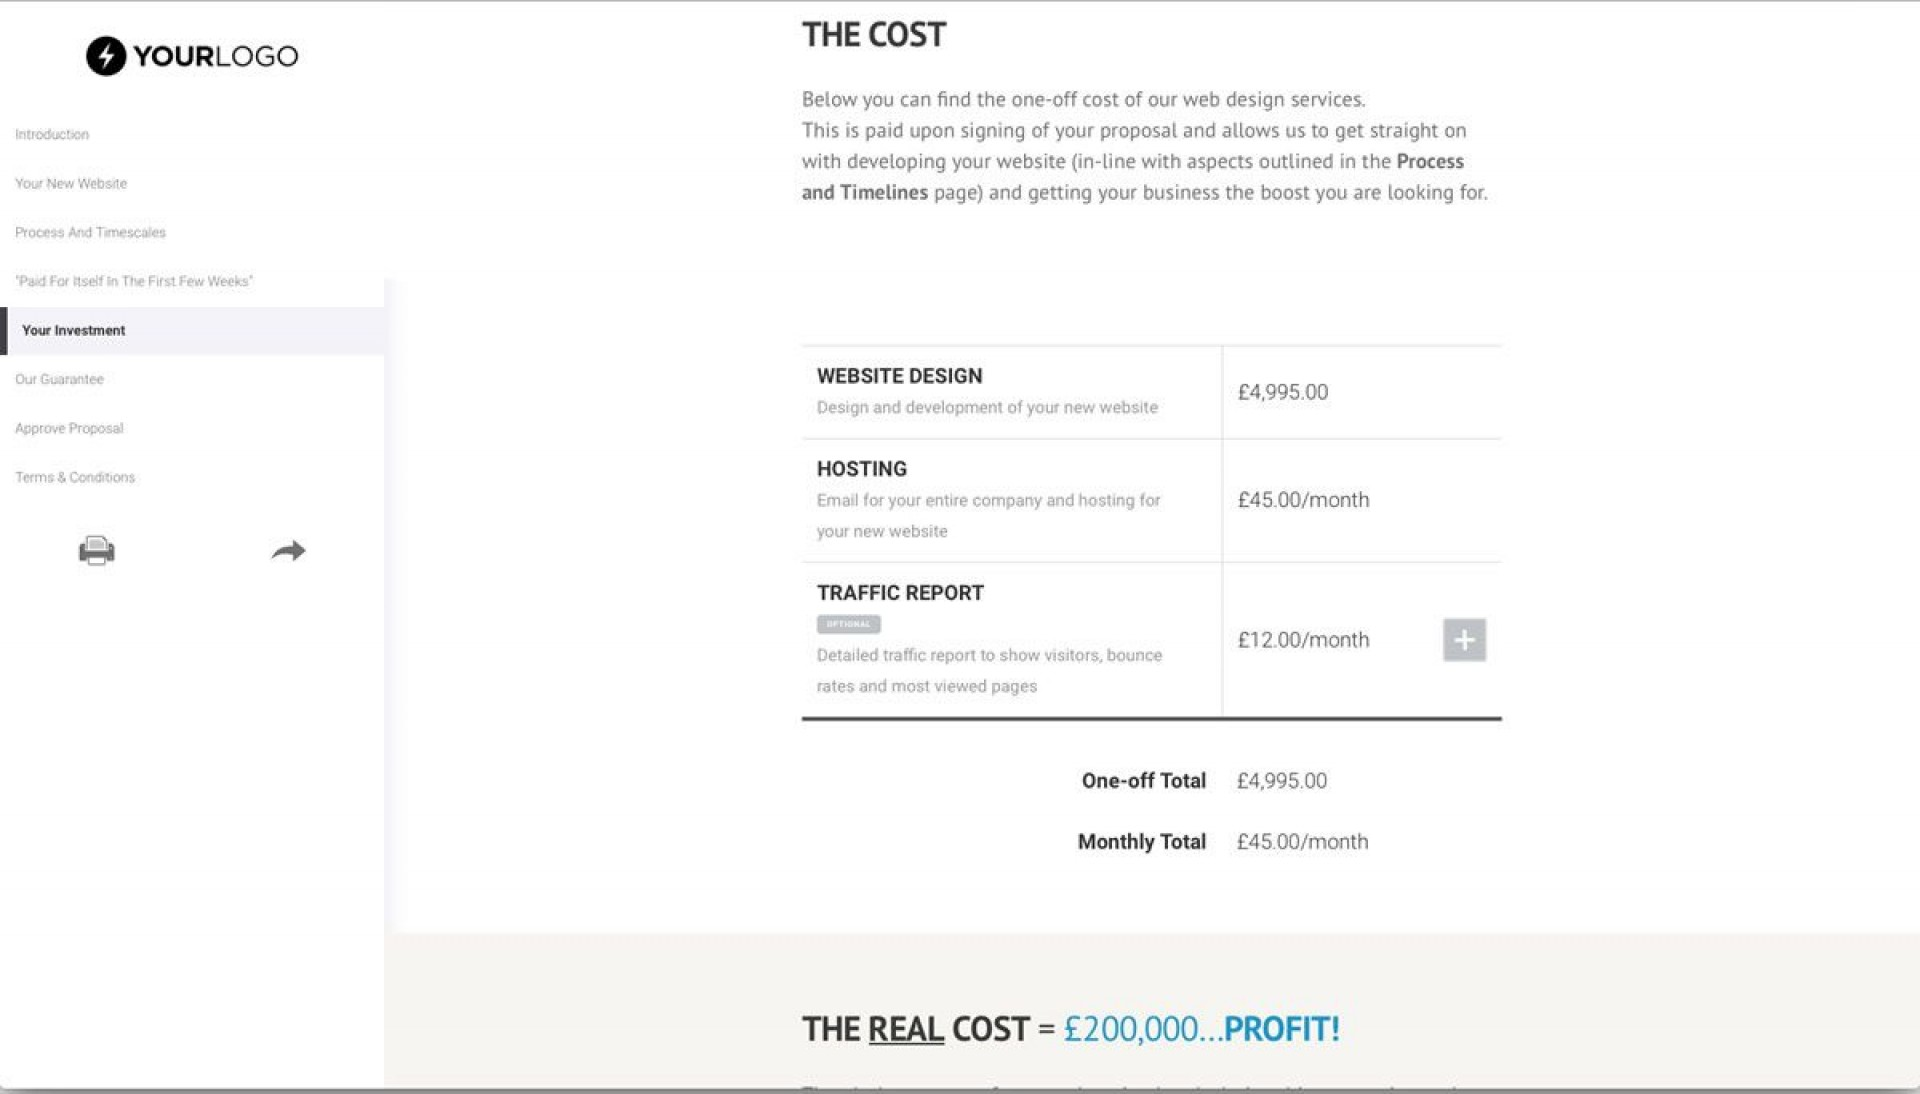 005 Remarkable Freelance Website Design Proposal Template Picture 1920